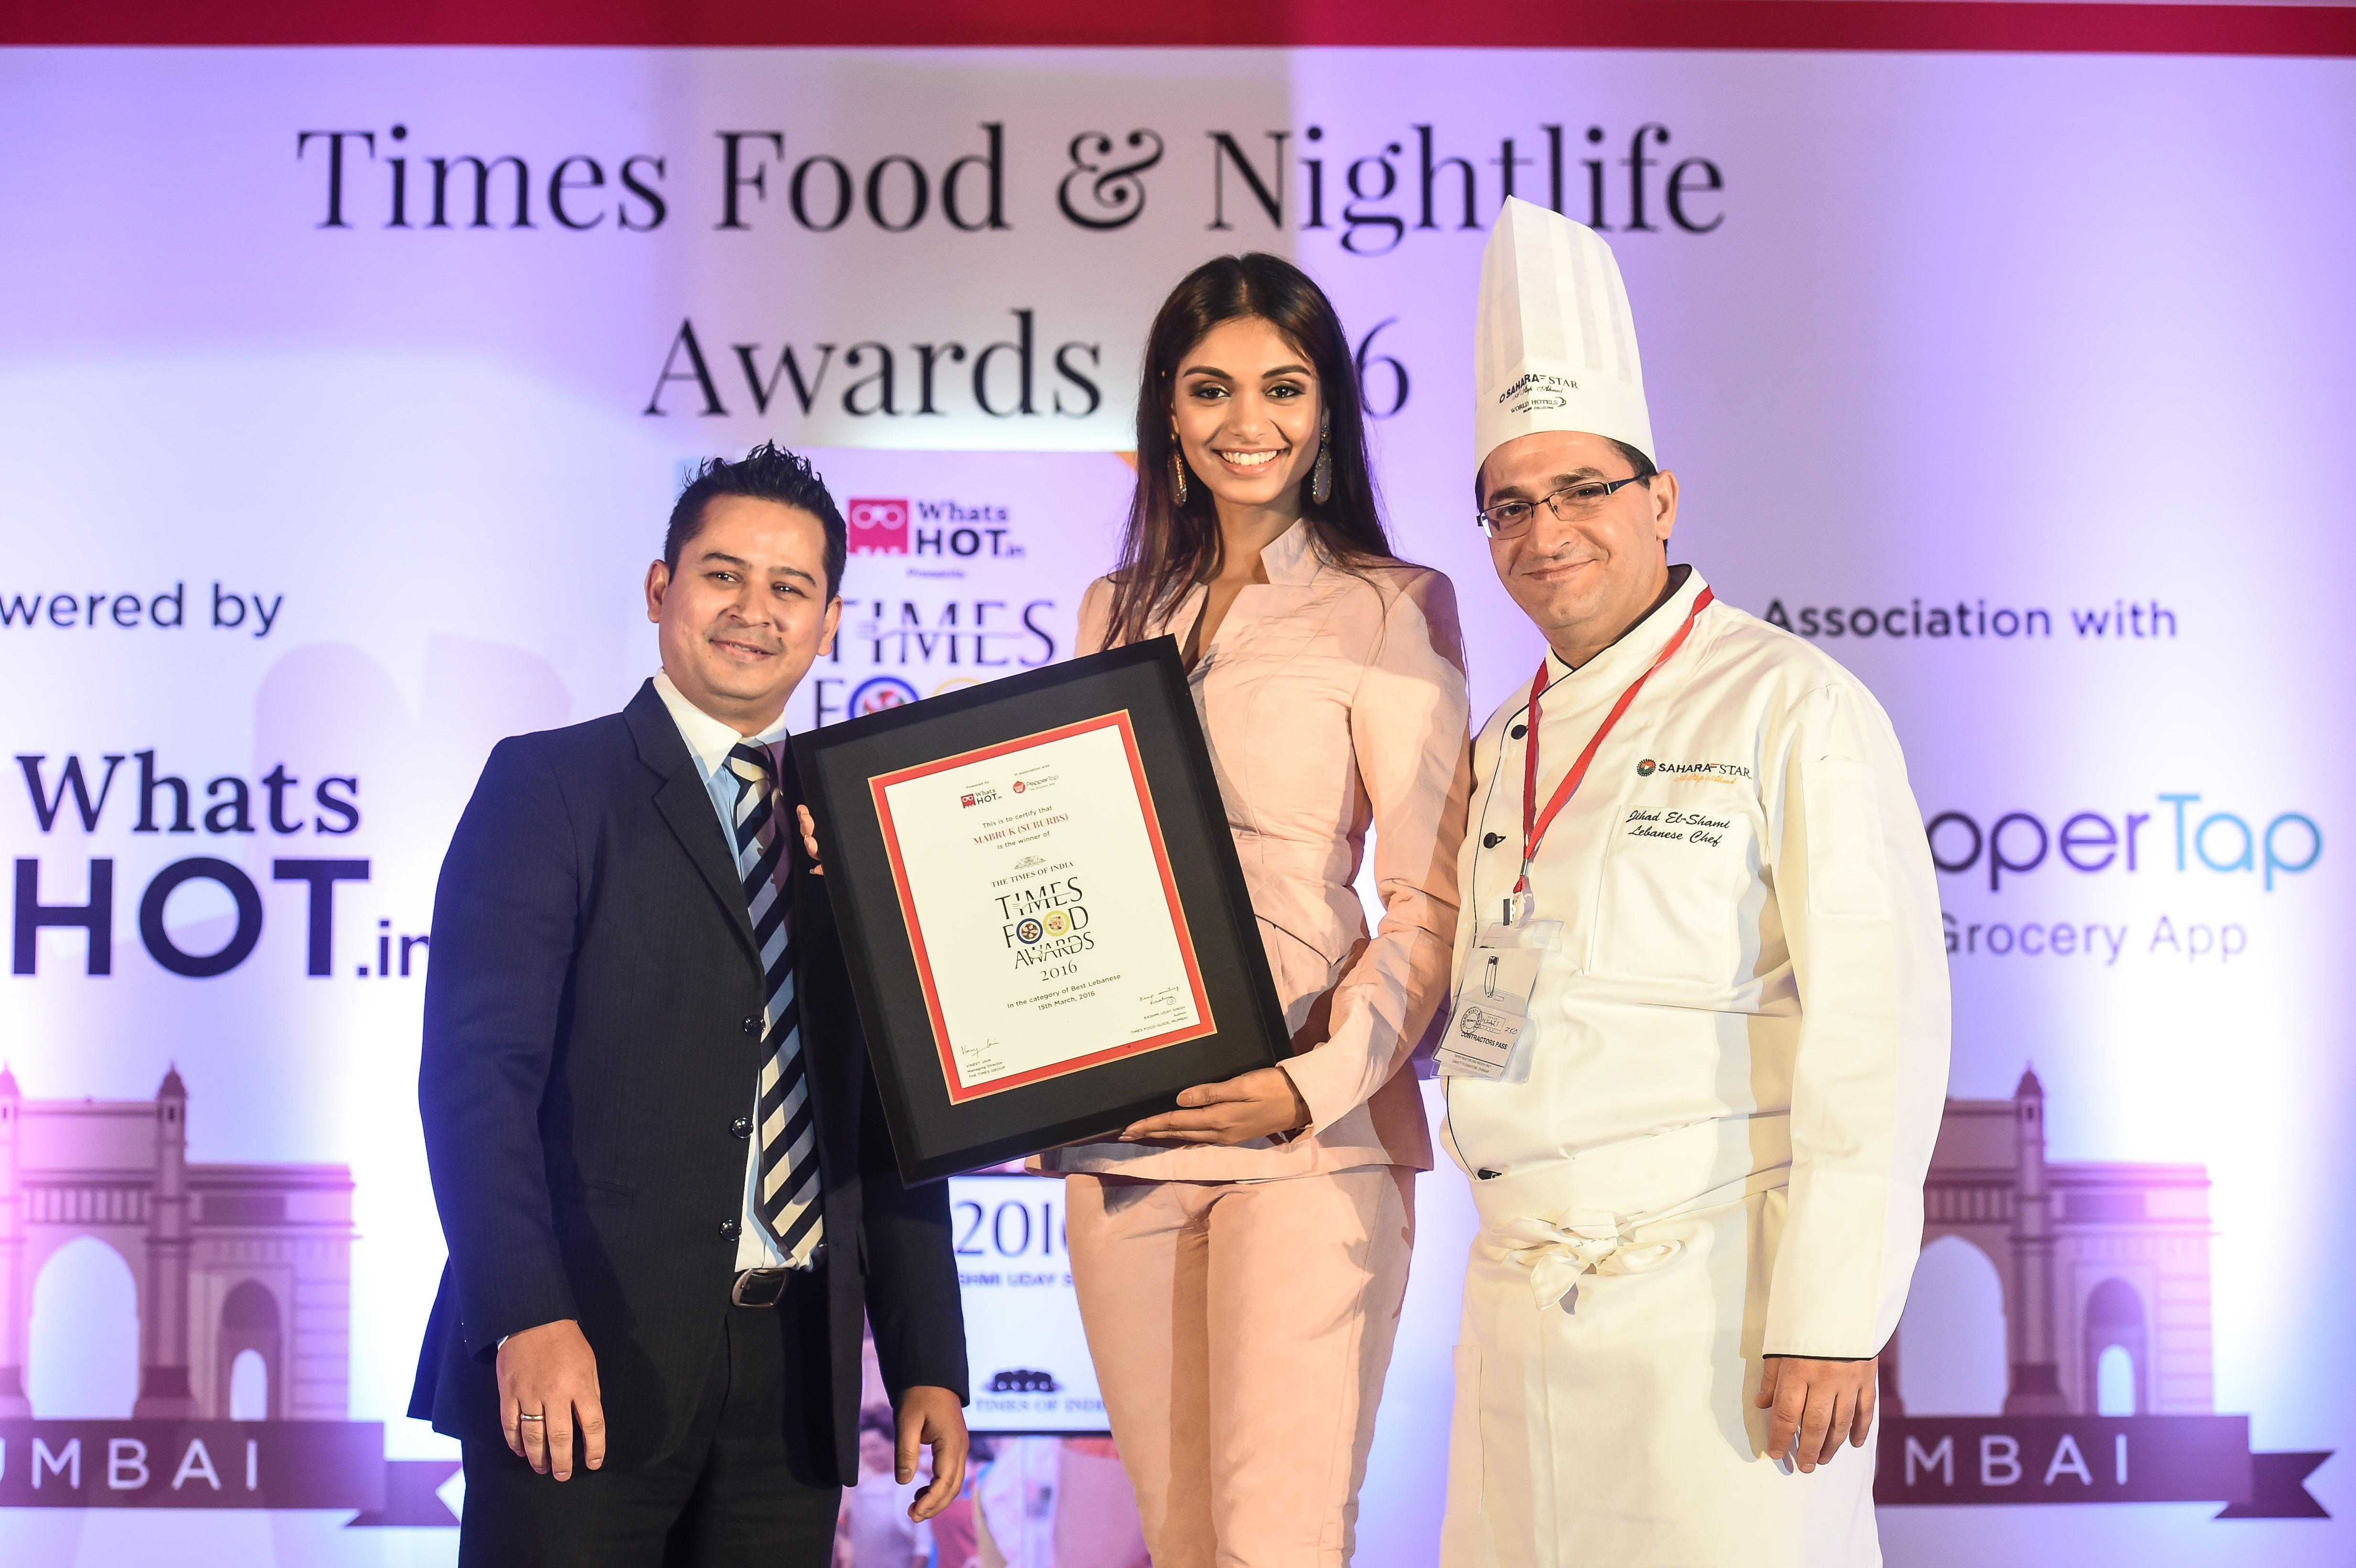 Times Food Awards 2016